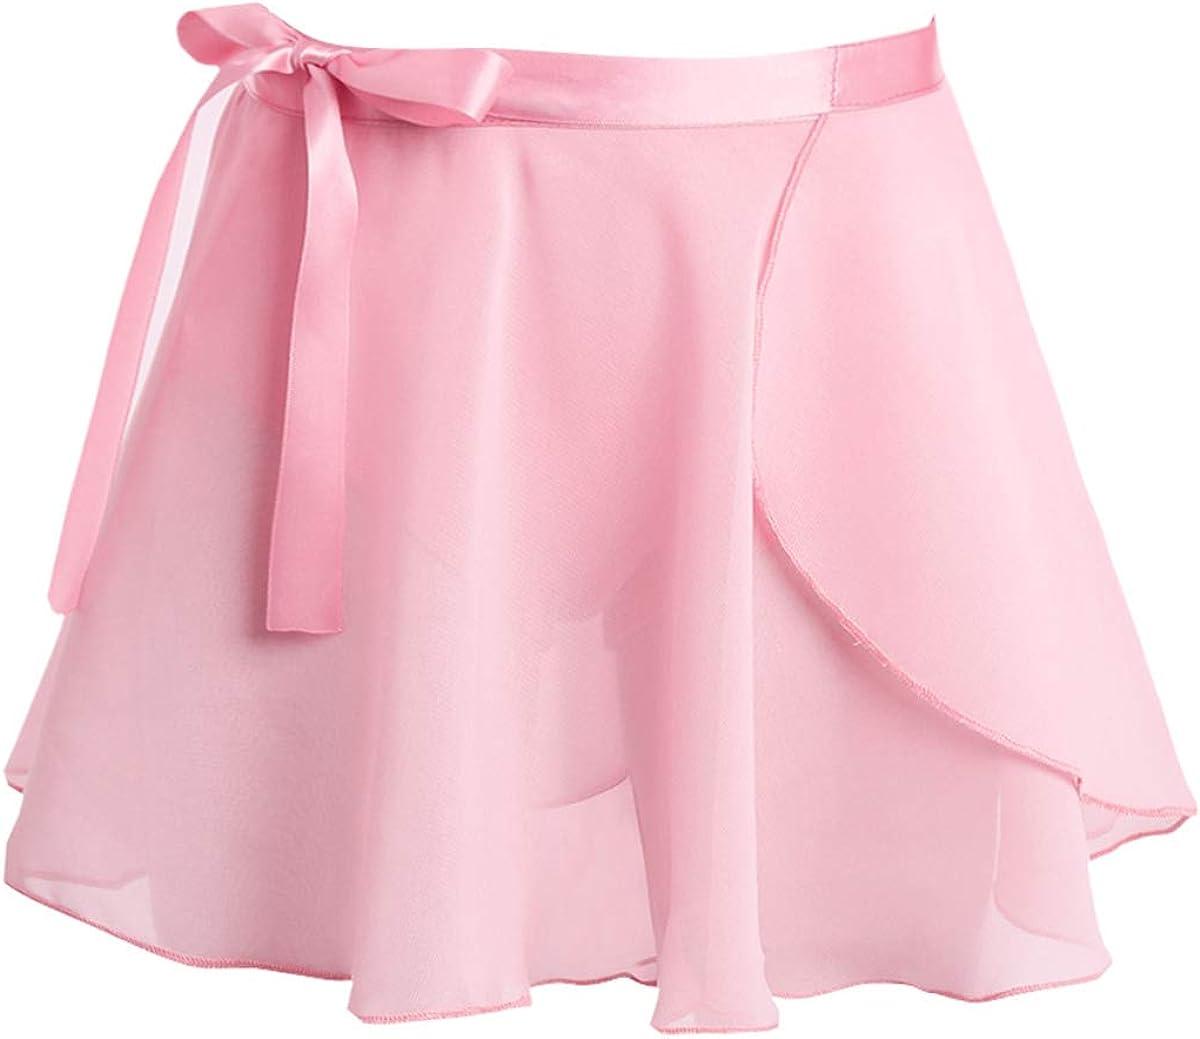 renvena Kids Girls Classic Chiffon Mini Pull-On Wrap Skirts with Waist Tie Ballet Dance Gymnastic Dancewear